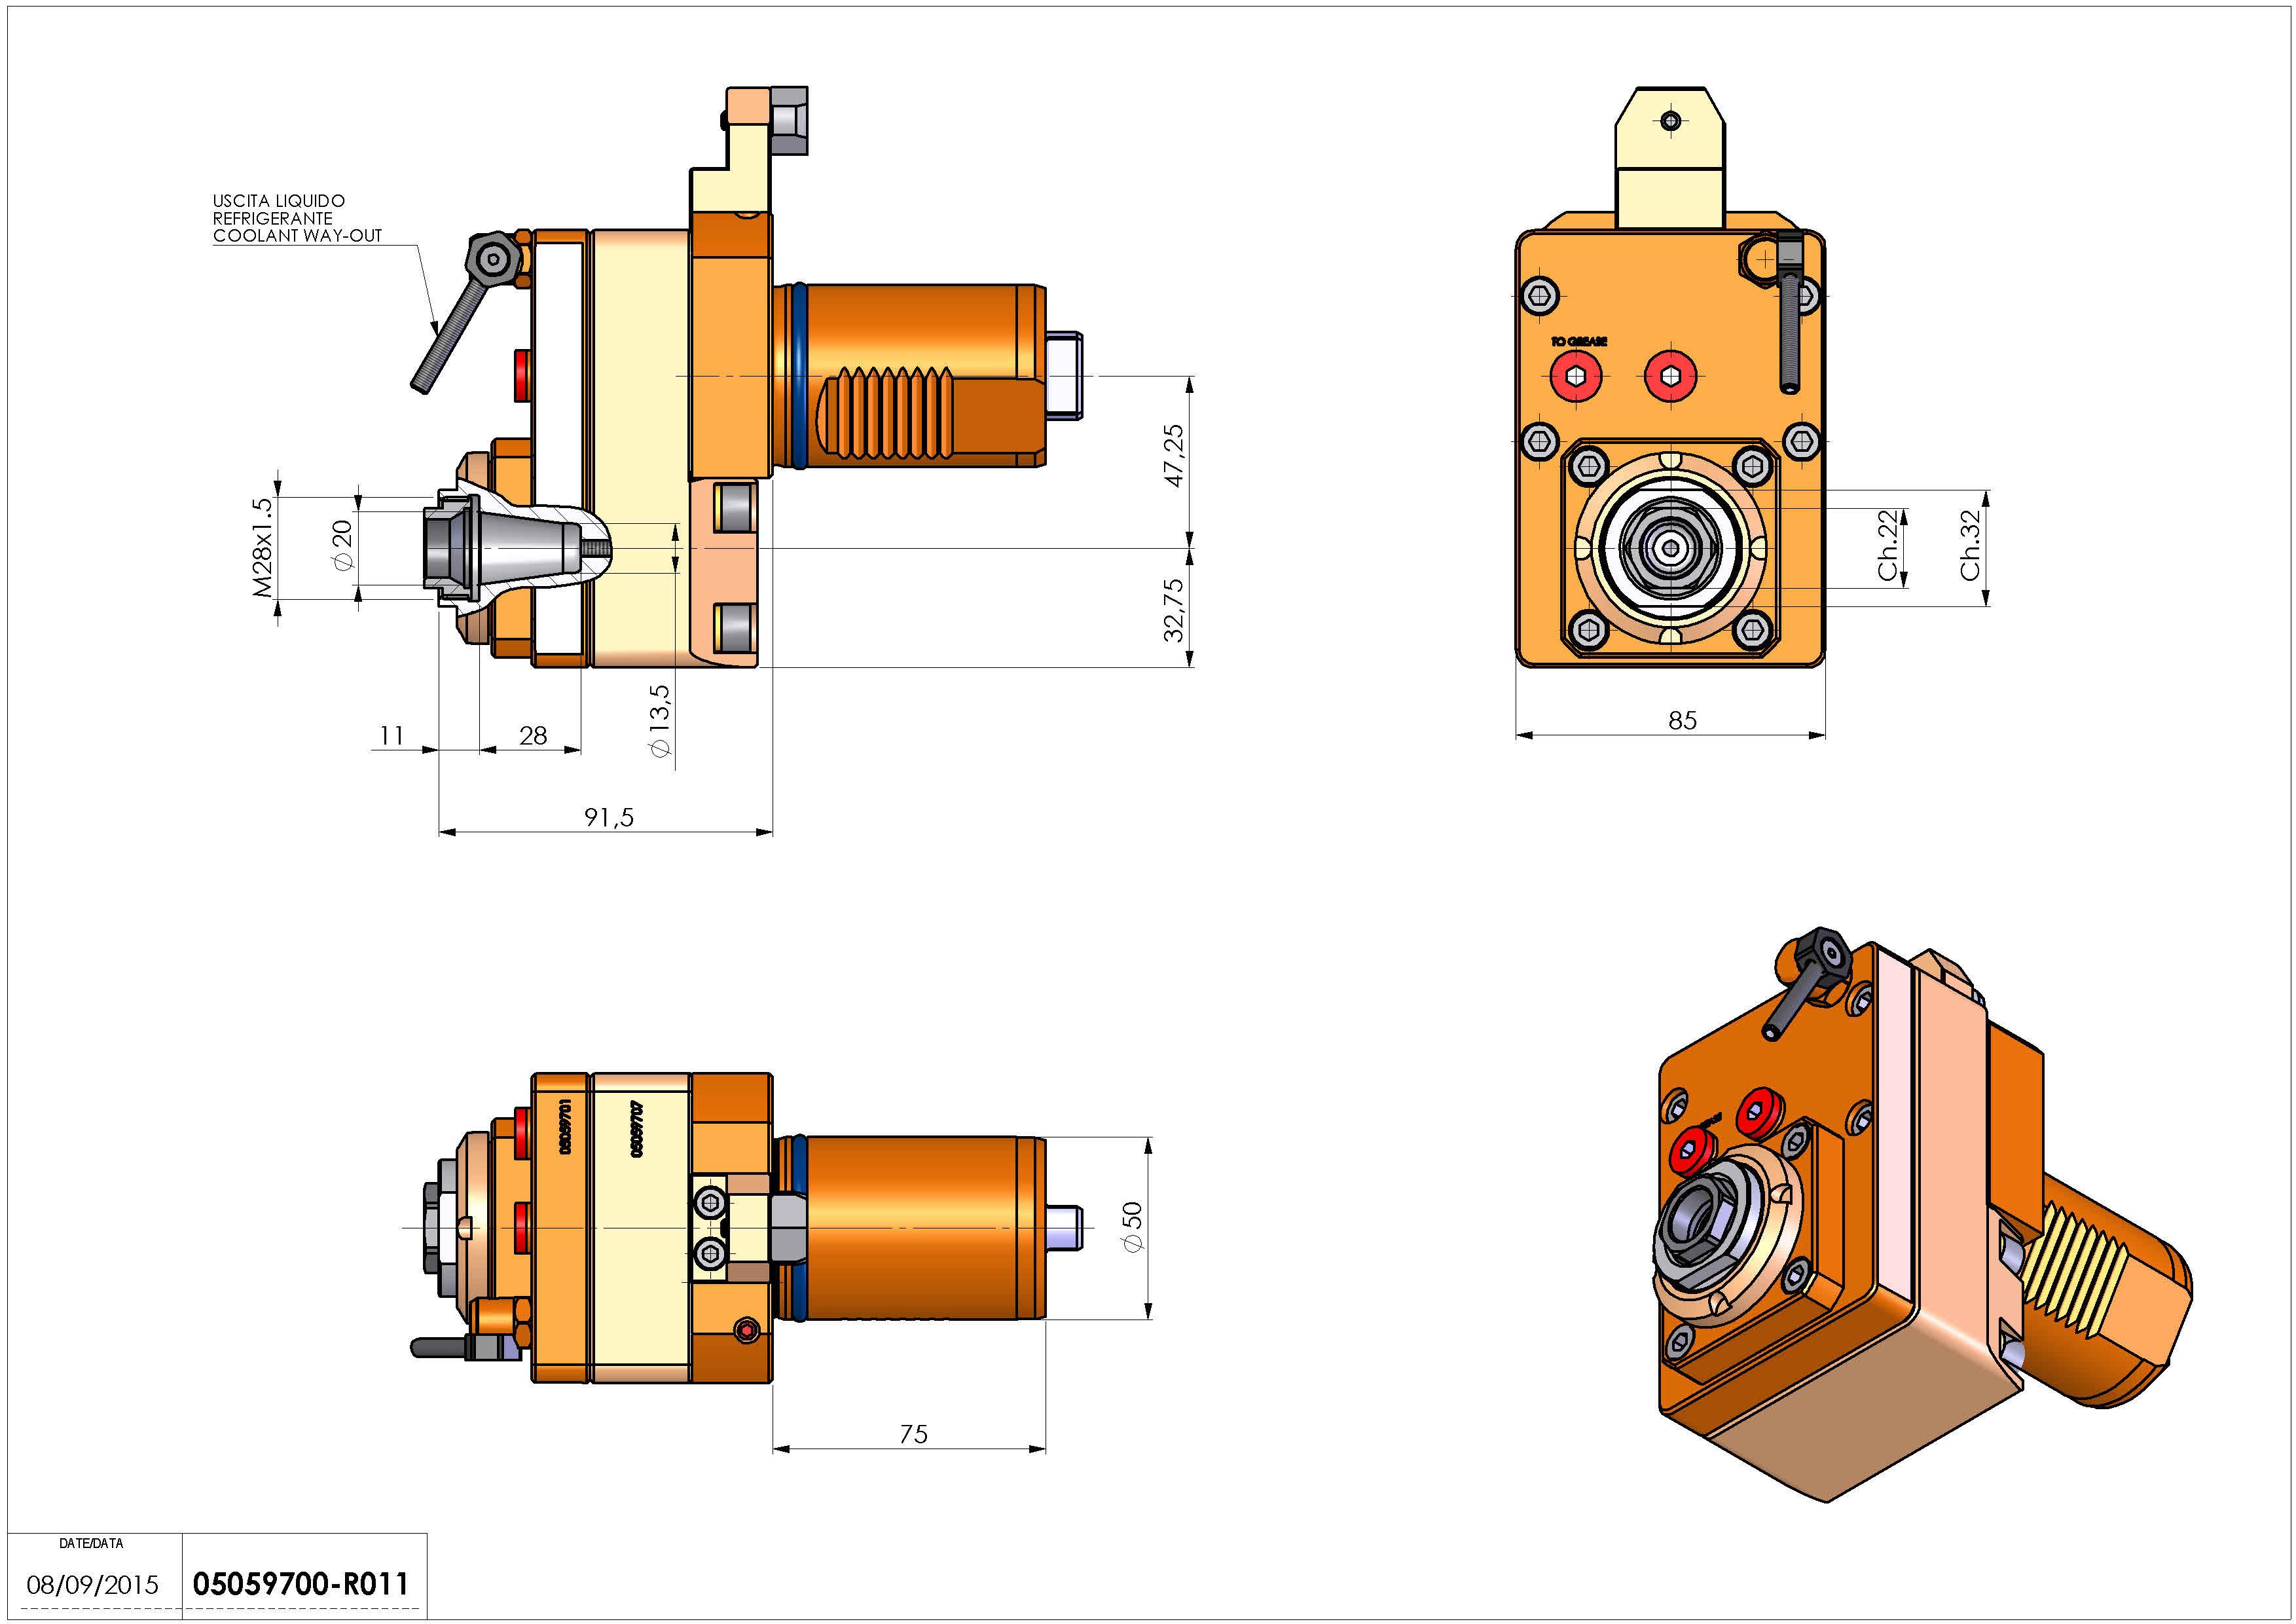 Technical image - LT-S VDI50ER20F OFS78 L 1:3H89.